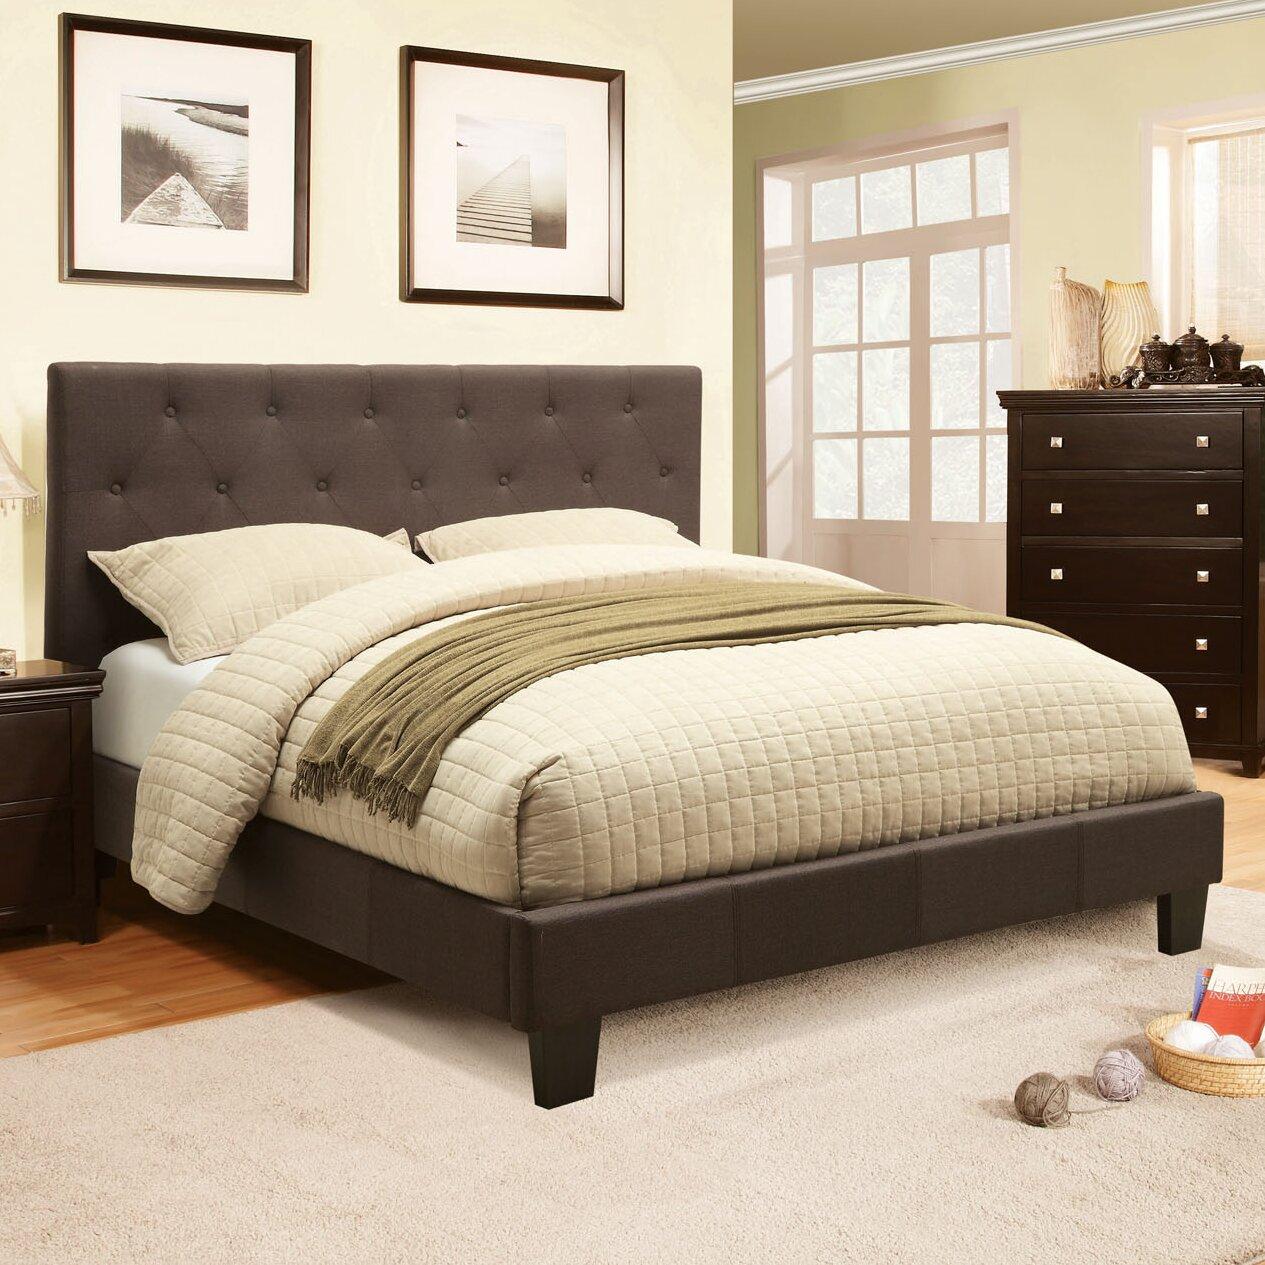 Hokku Designs Chernoll Upholstered Platform Bed Reviews